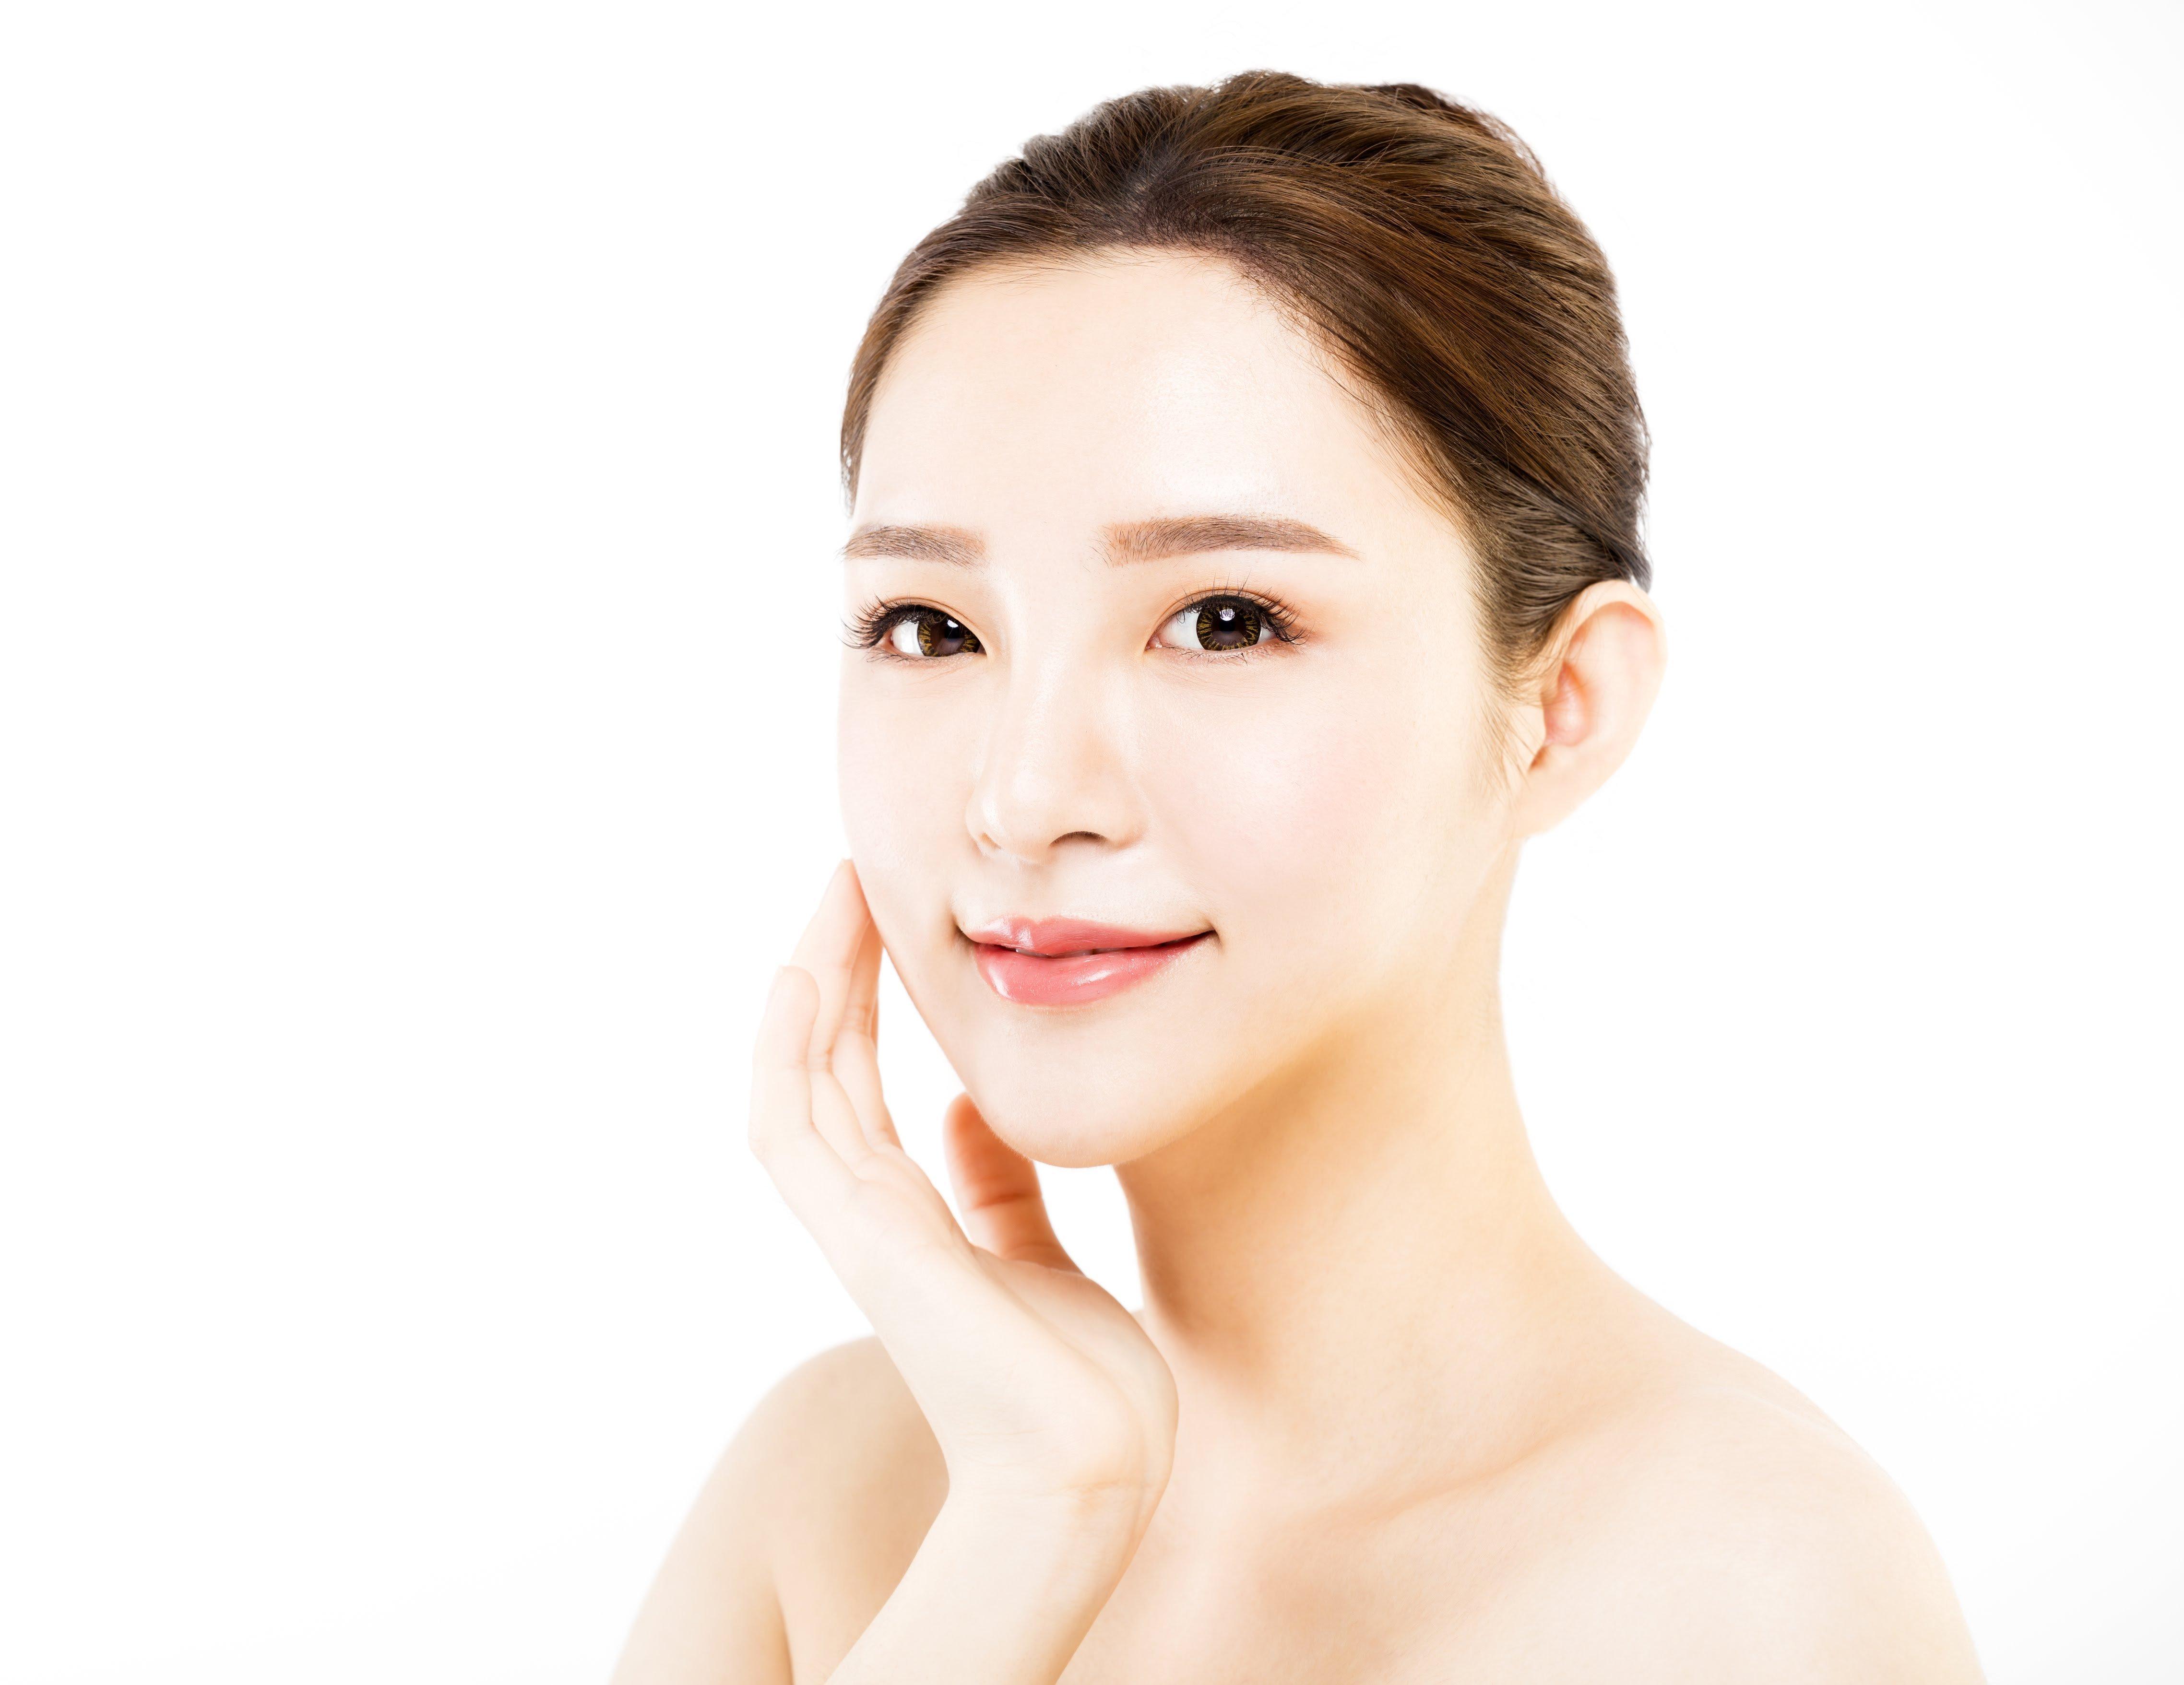 Korean Women Beauty Trends